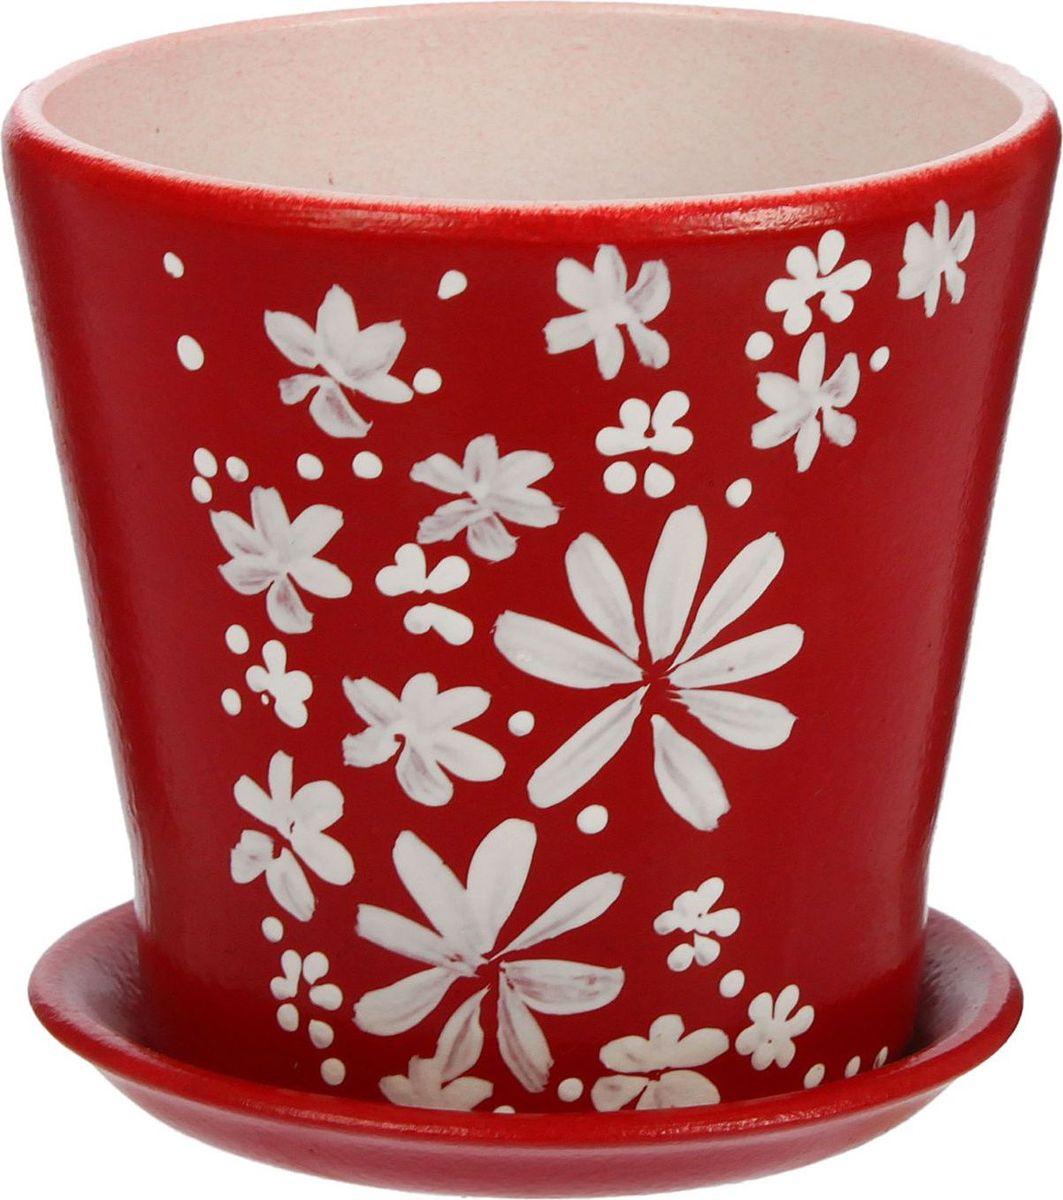 Кашпо Вальс цветов, 0,5 л1157315